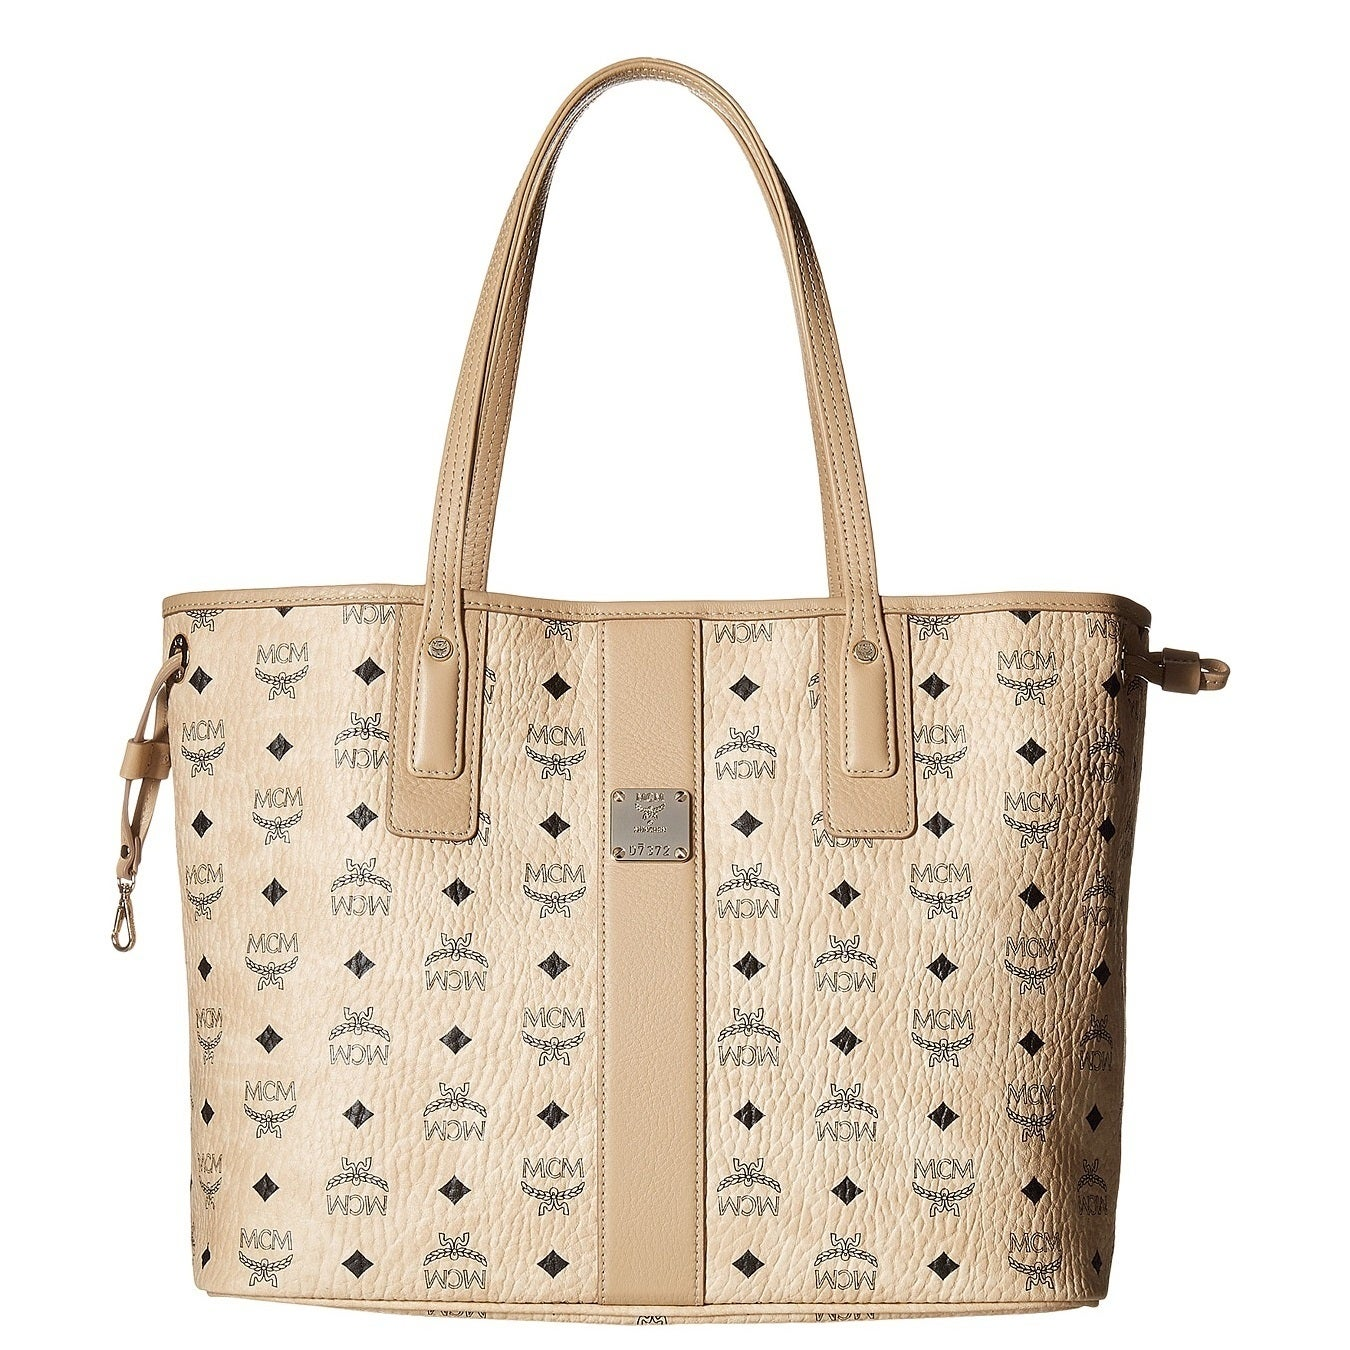 8f3b0532a214f9 Designer Handbags | Find Great Designer Store Deals Shopping at Overstock